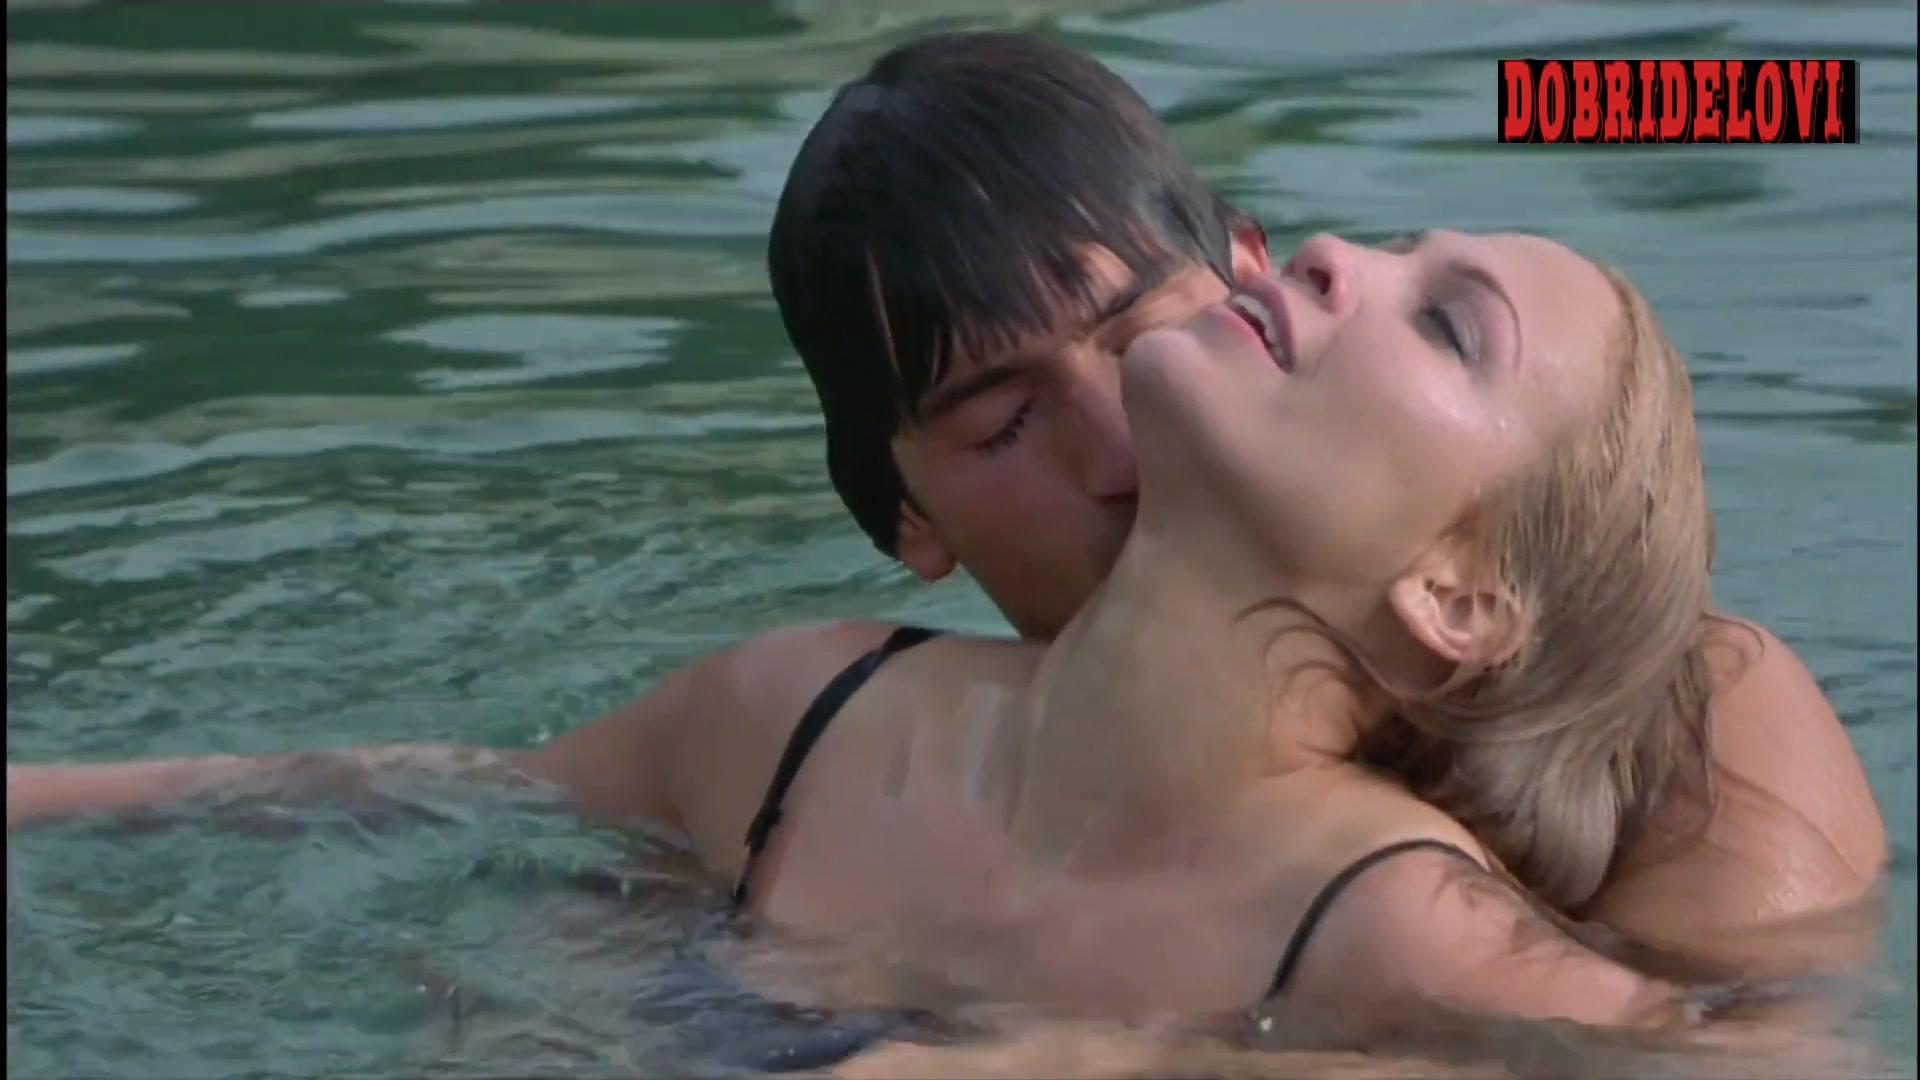 Jennifer Lopez dunks into river scene from Angel Eyes